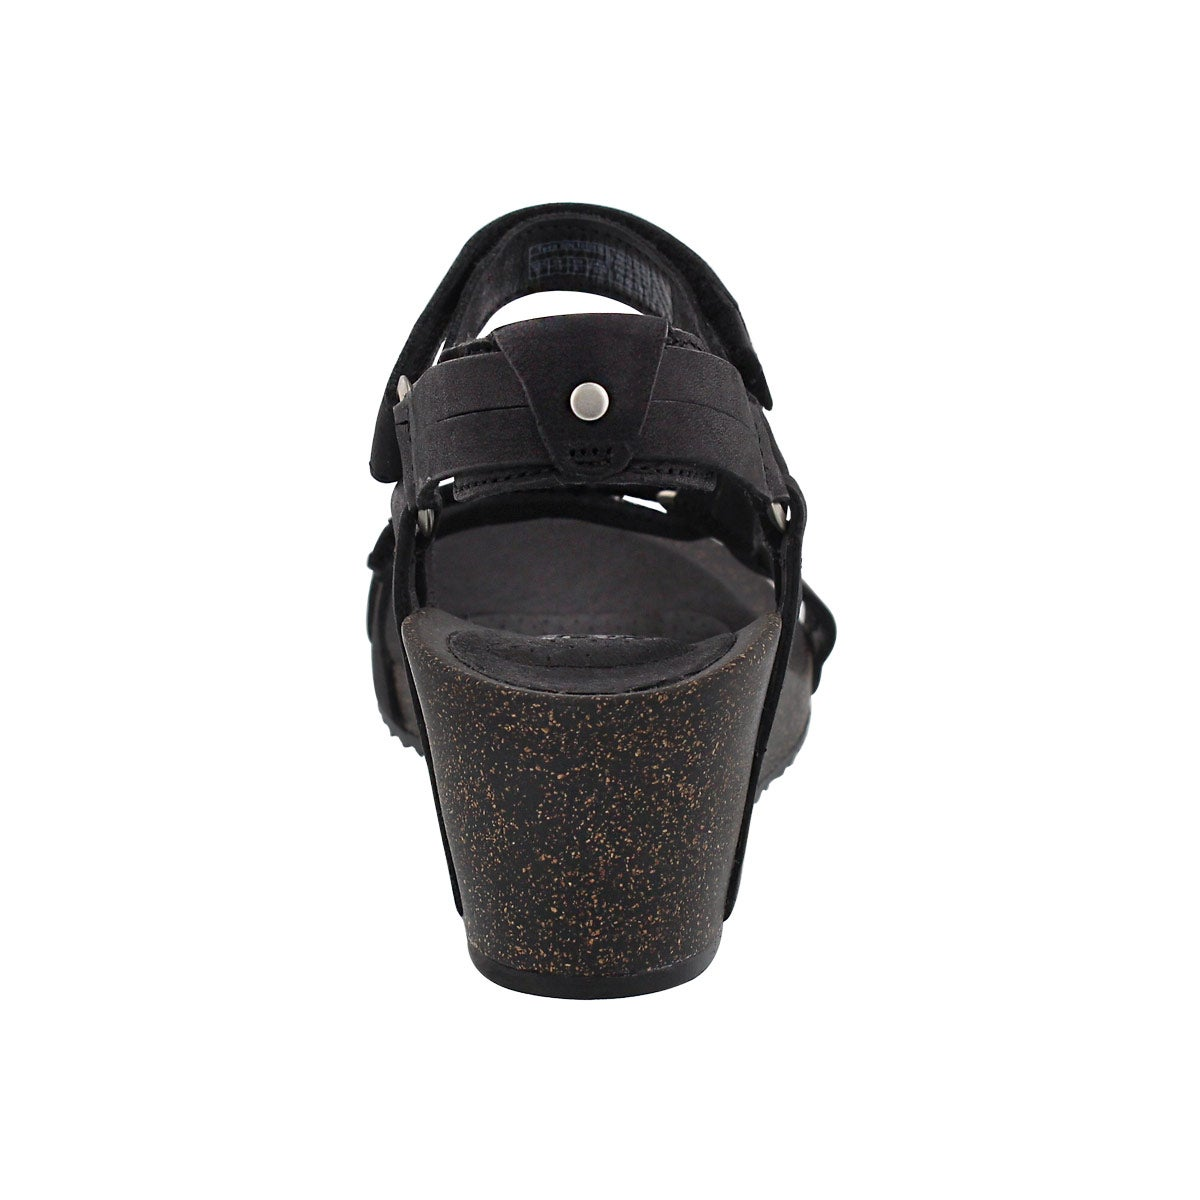 Lds Ysidro Universal blk wedge sandal